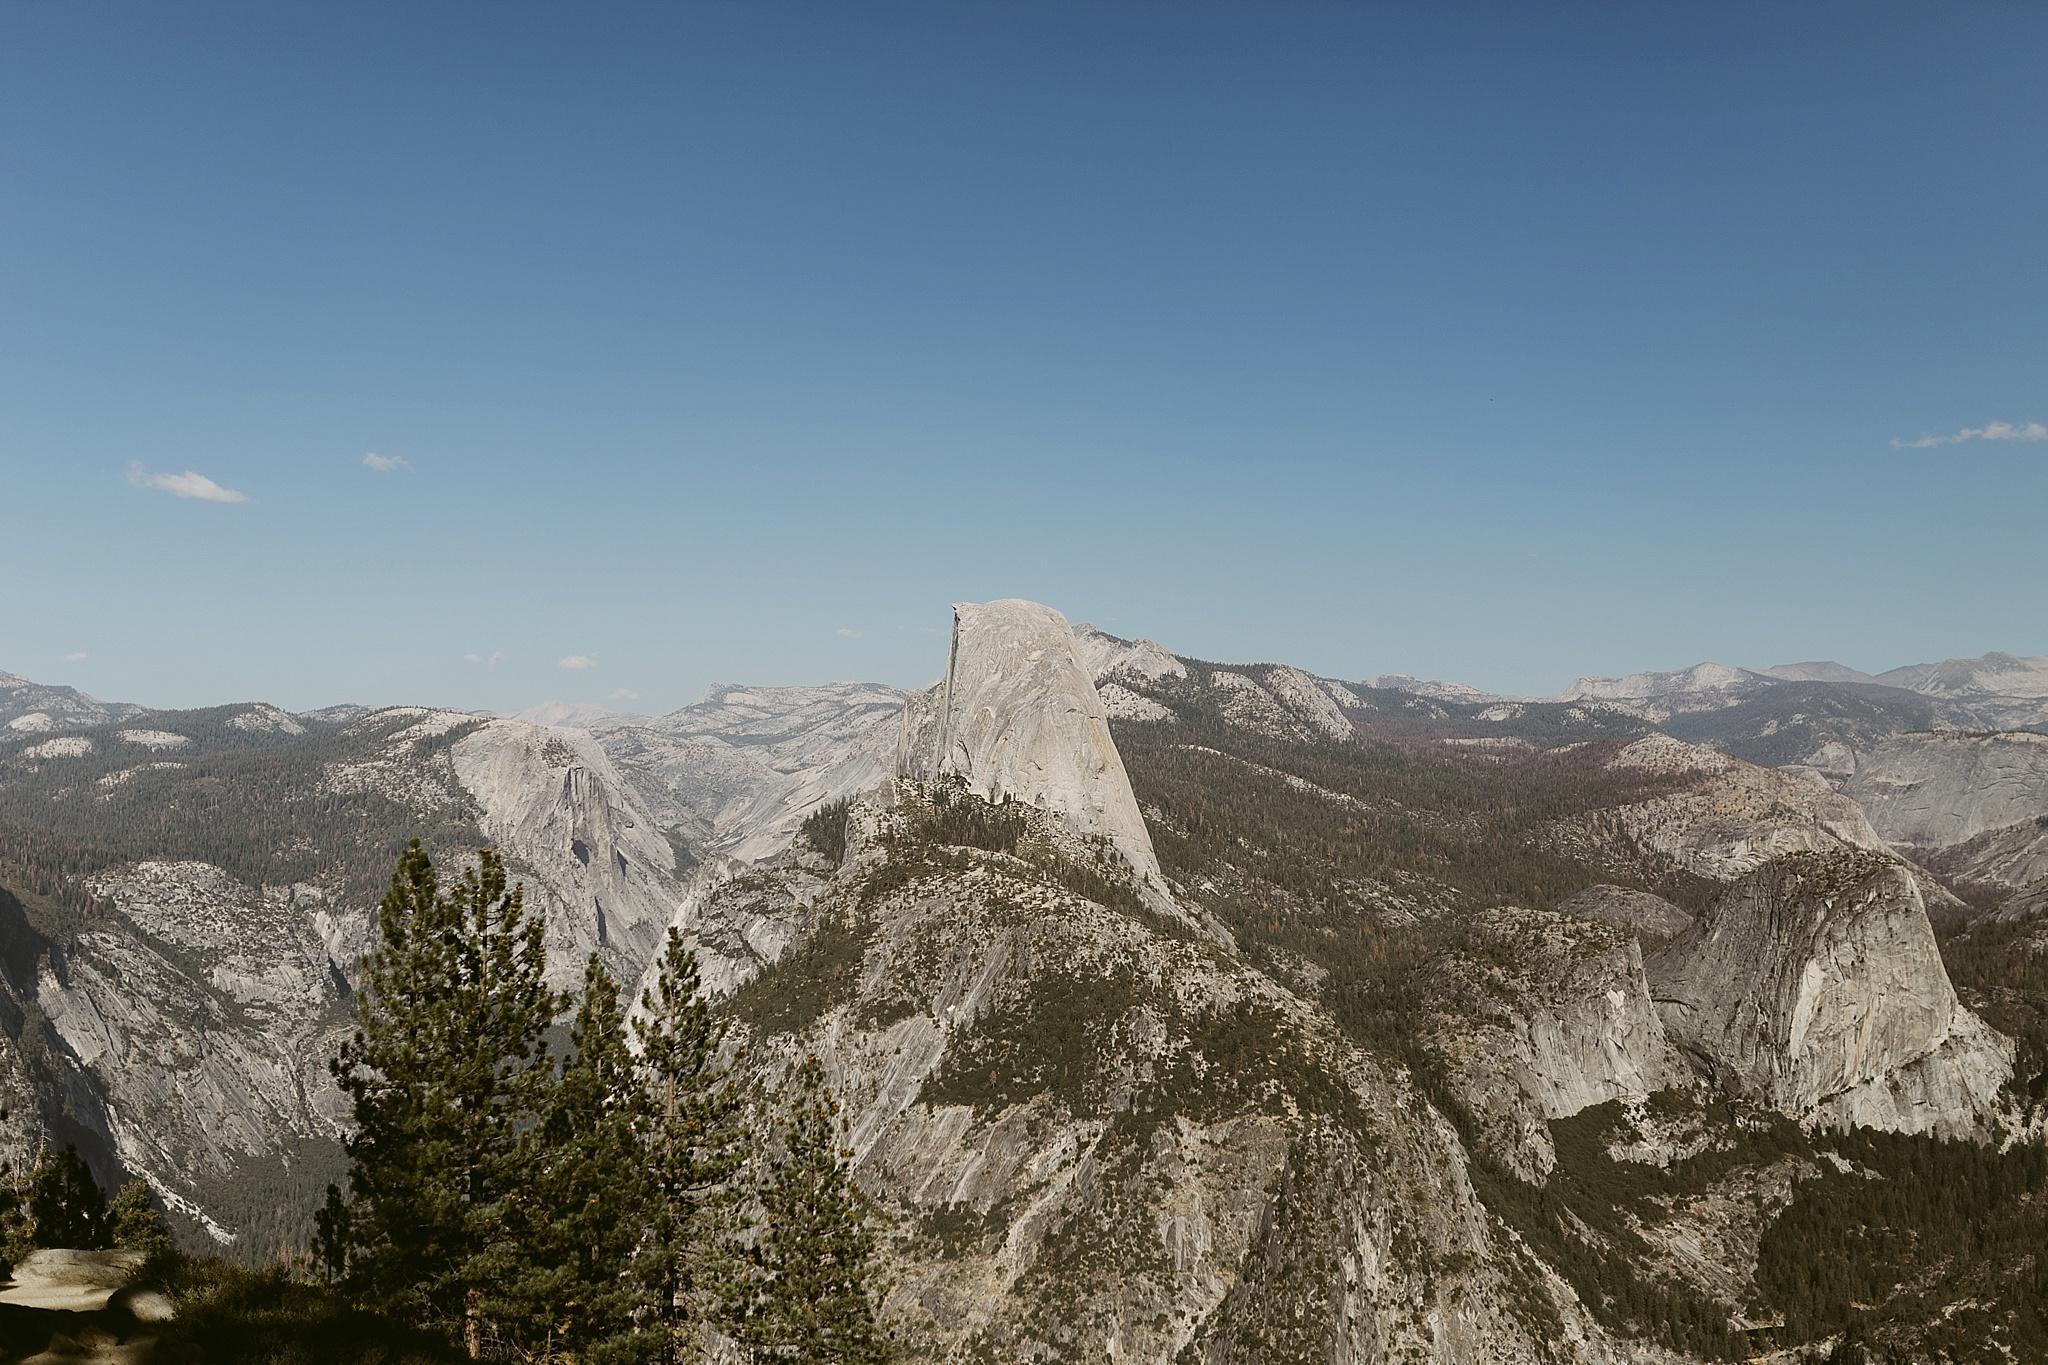 Yosemite marriage proposal - Yosemite wedding photographers - Northern California Wedding Photographers